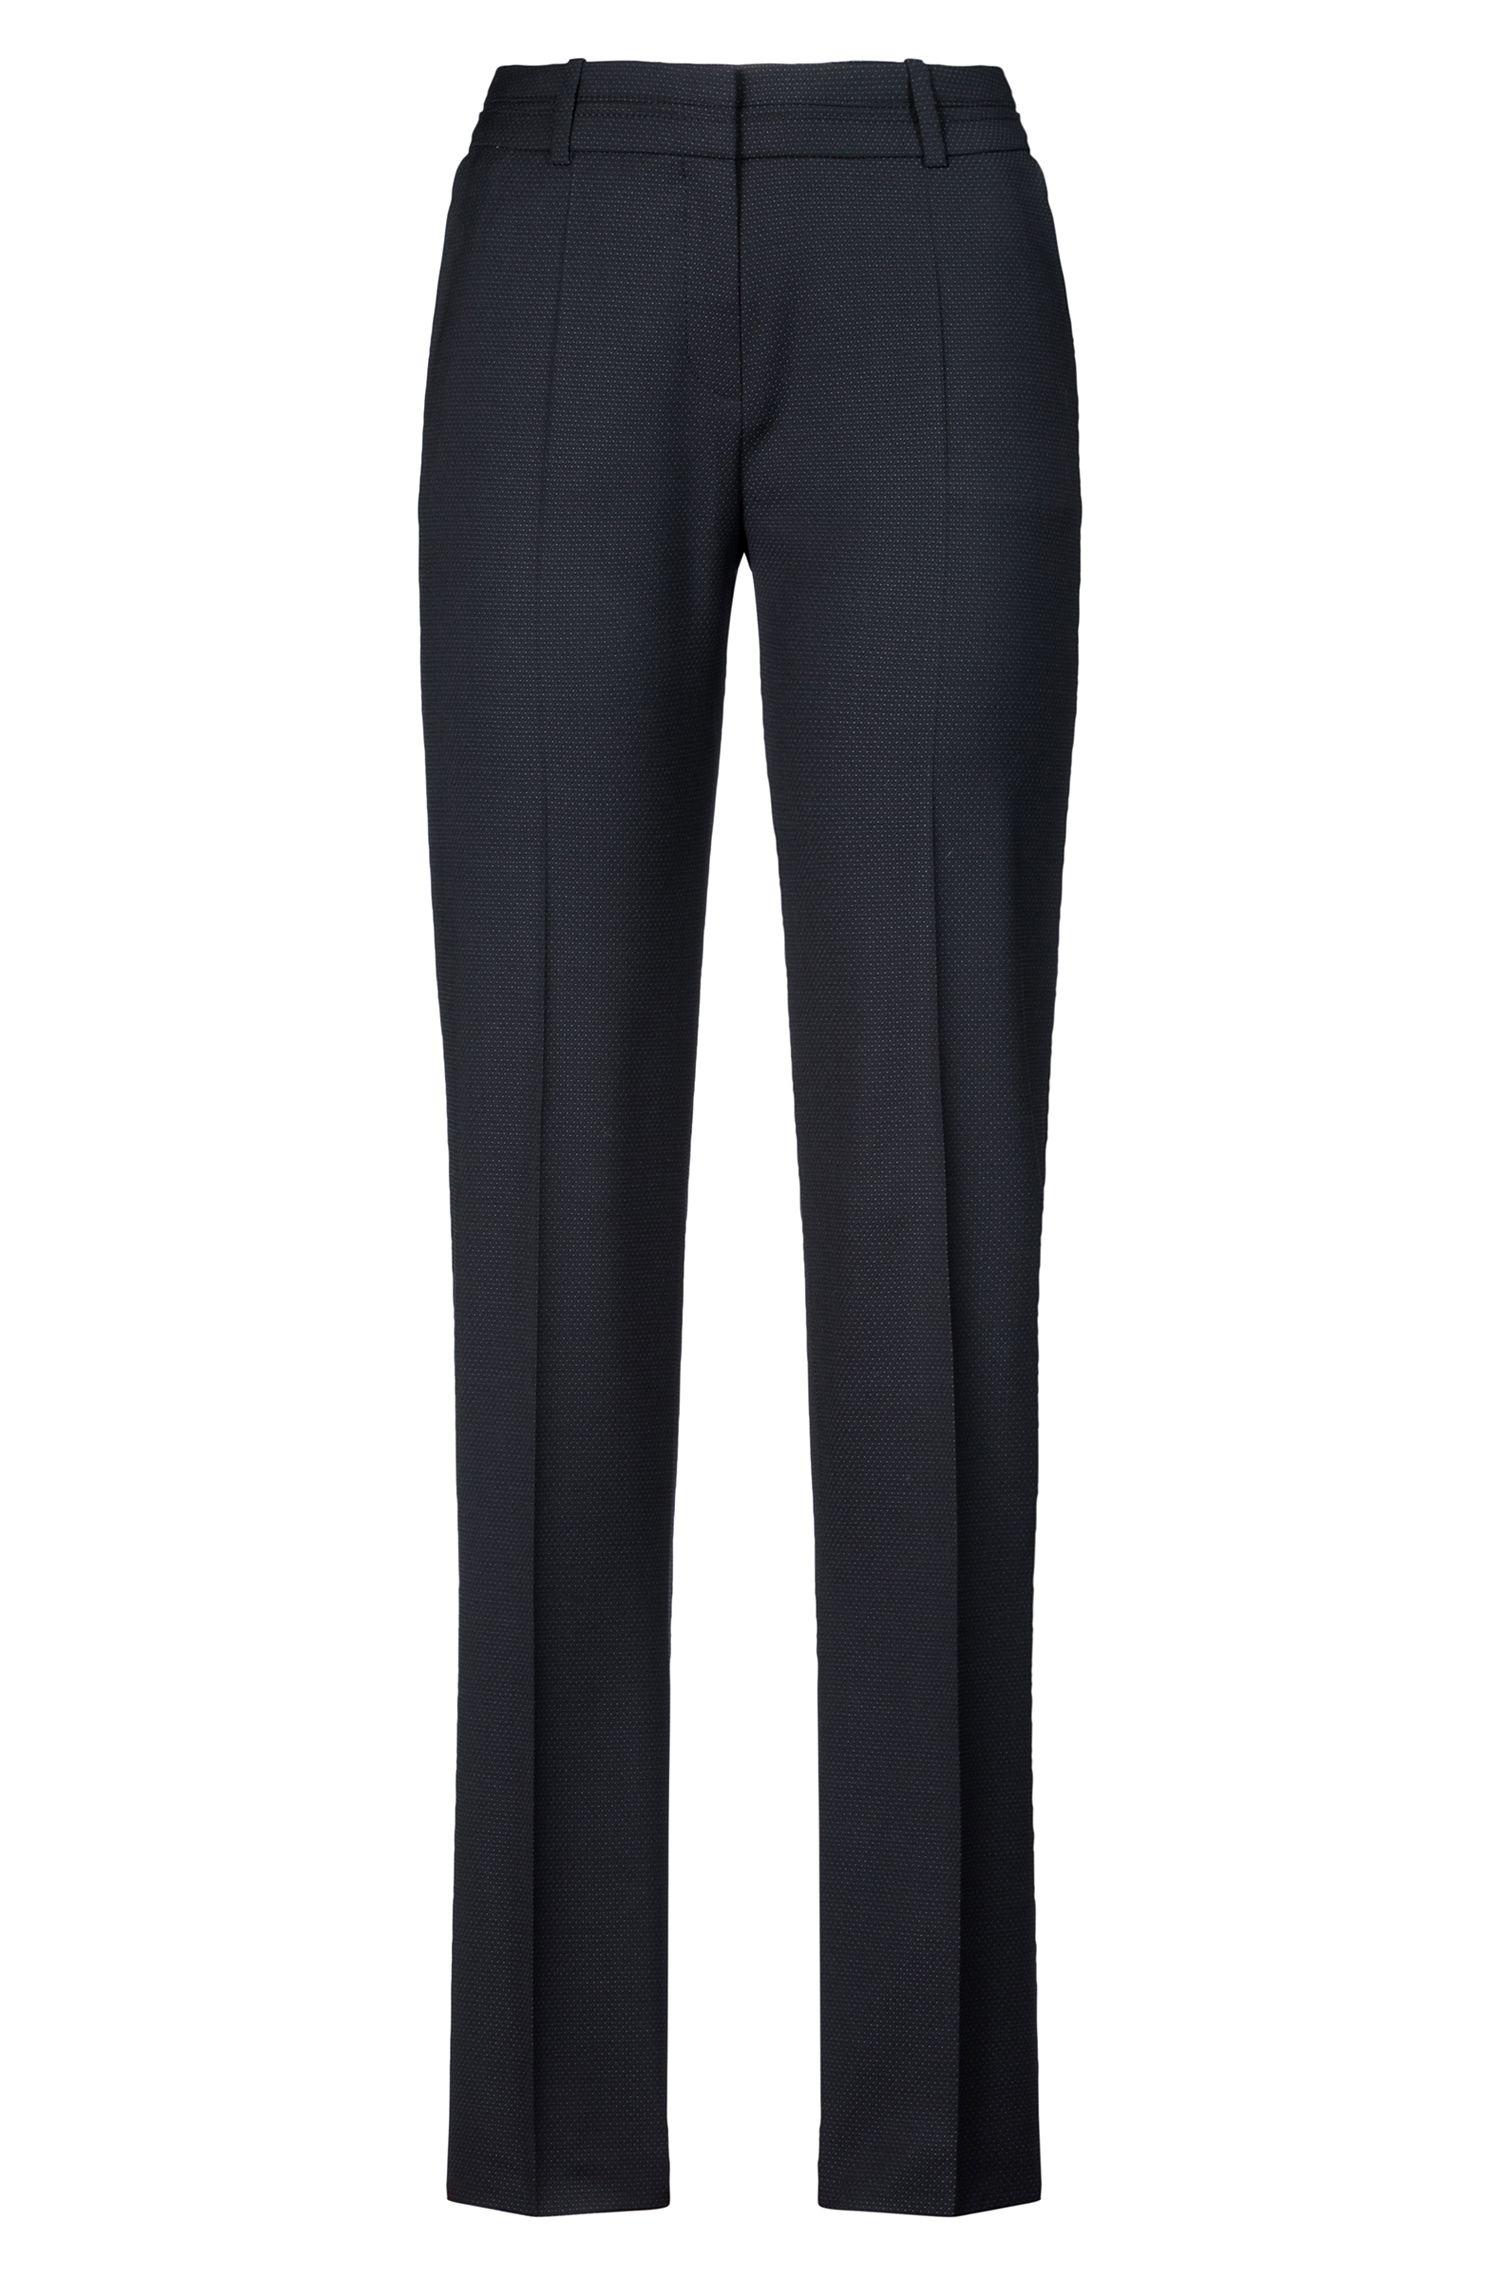 Regular-fit pants in a micro-pattern wool blend, Black